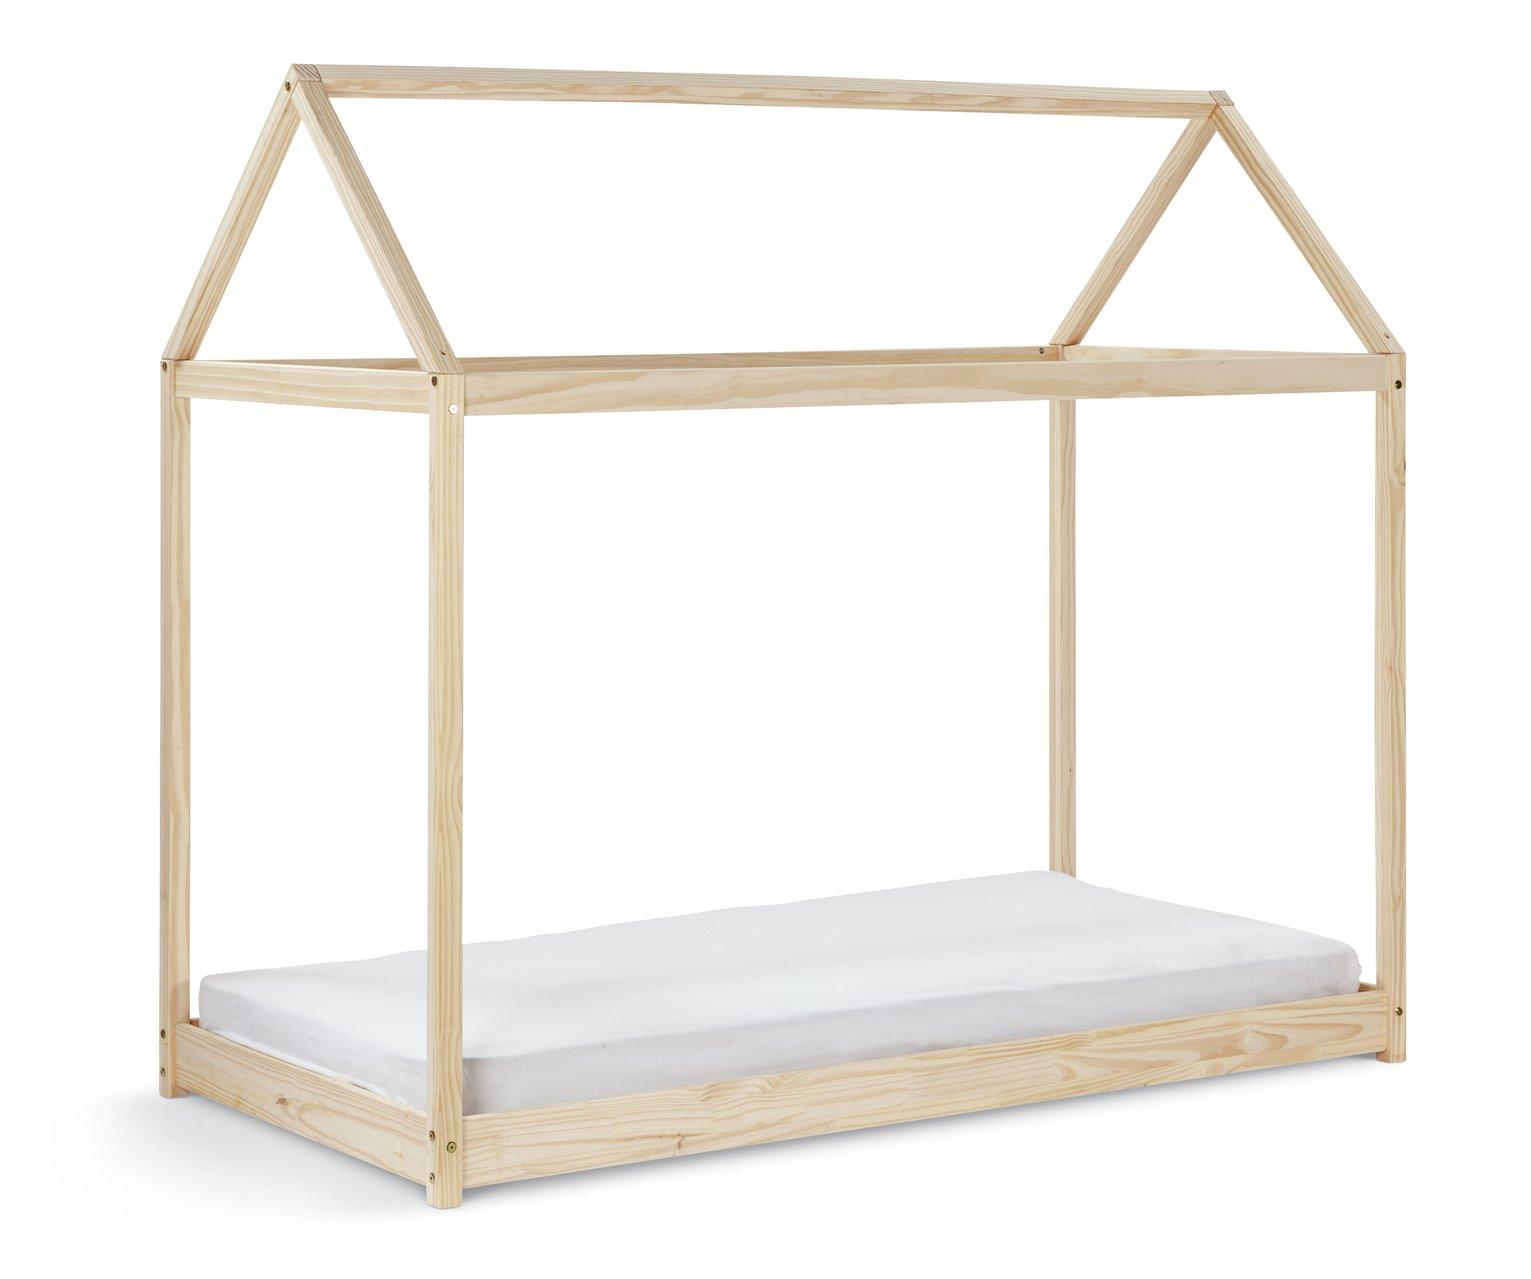 Habitat House Single Bed Frame and Kids Mattress - Pine